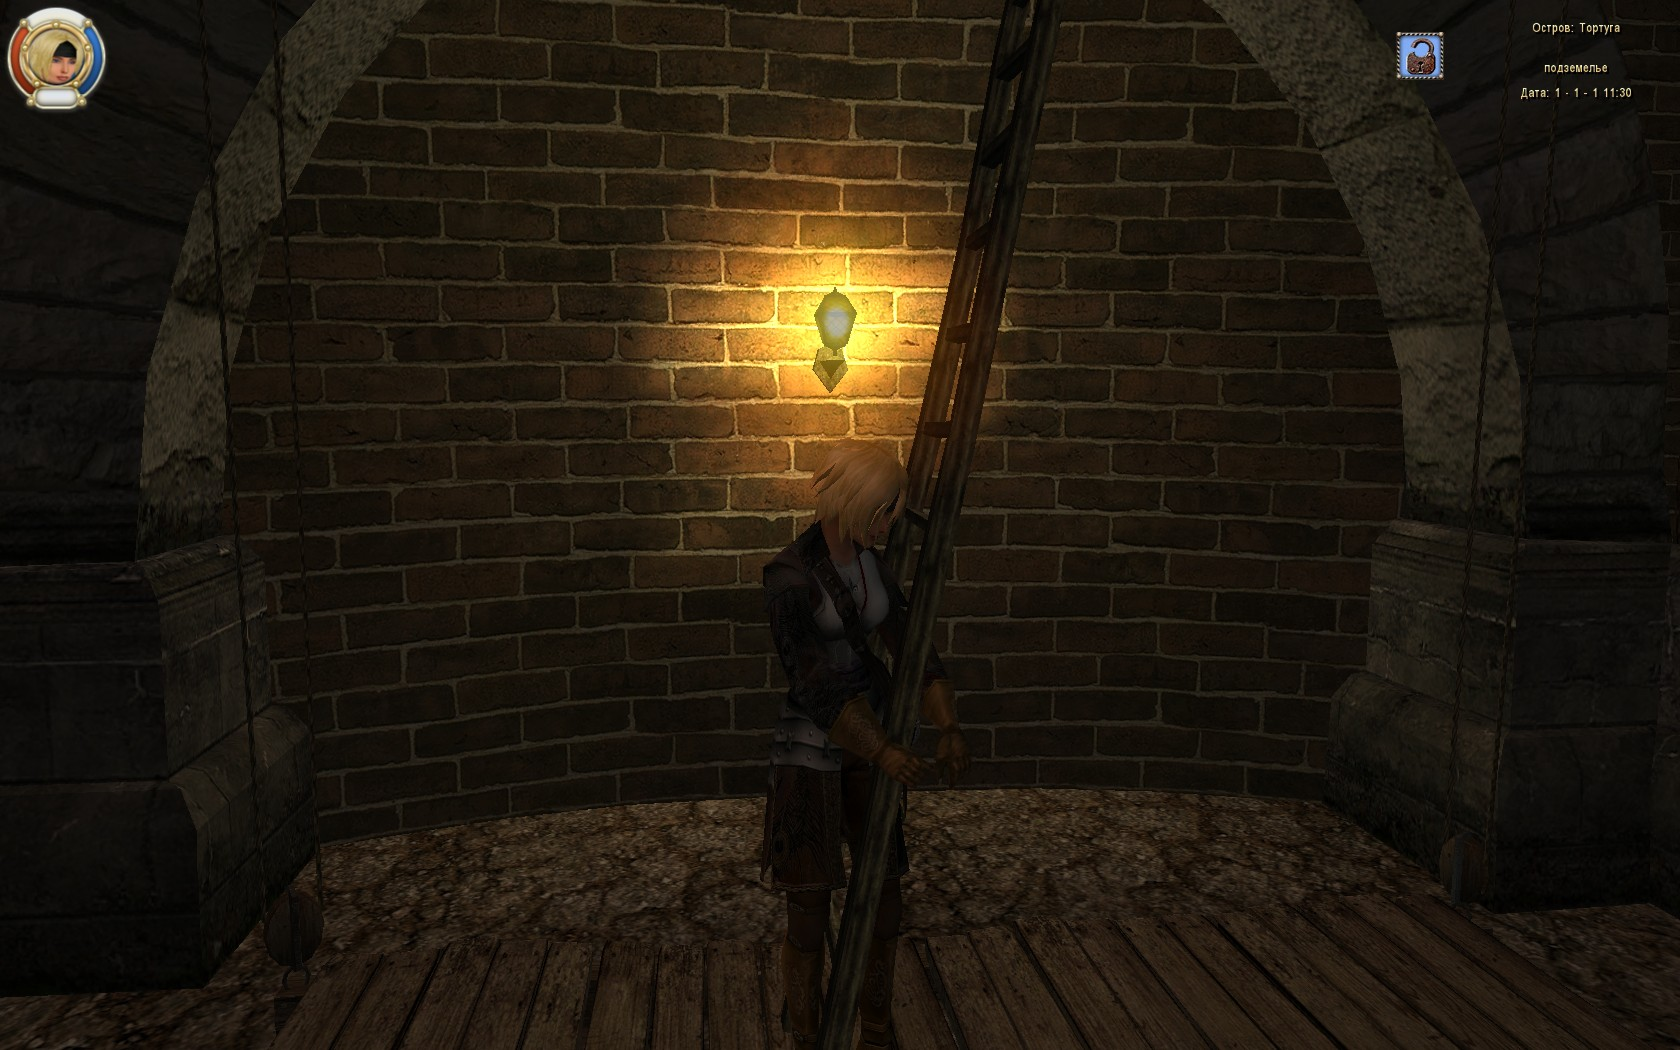 ladder3.jpg - -